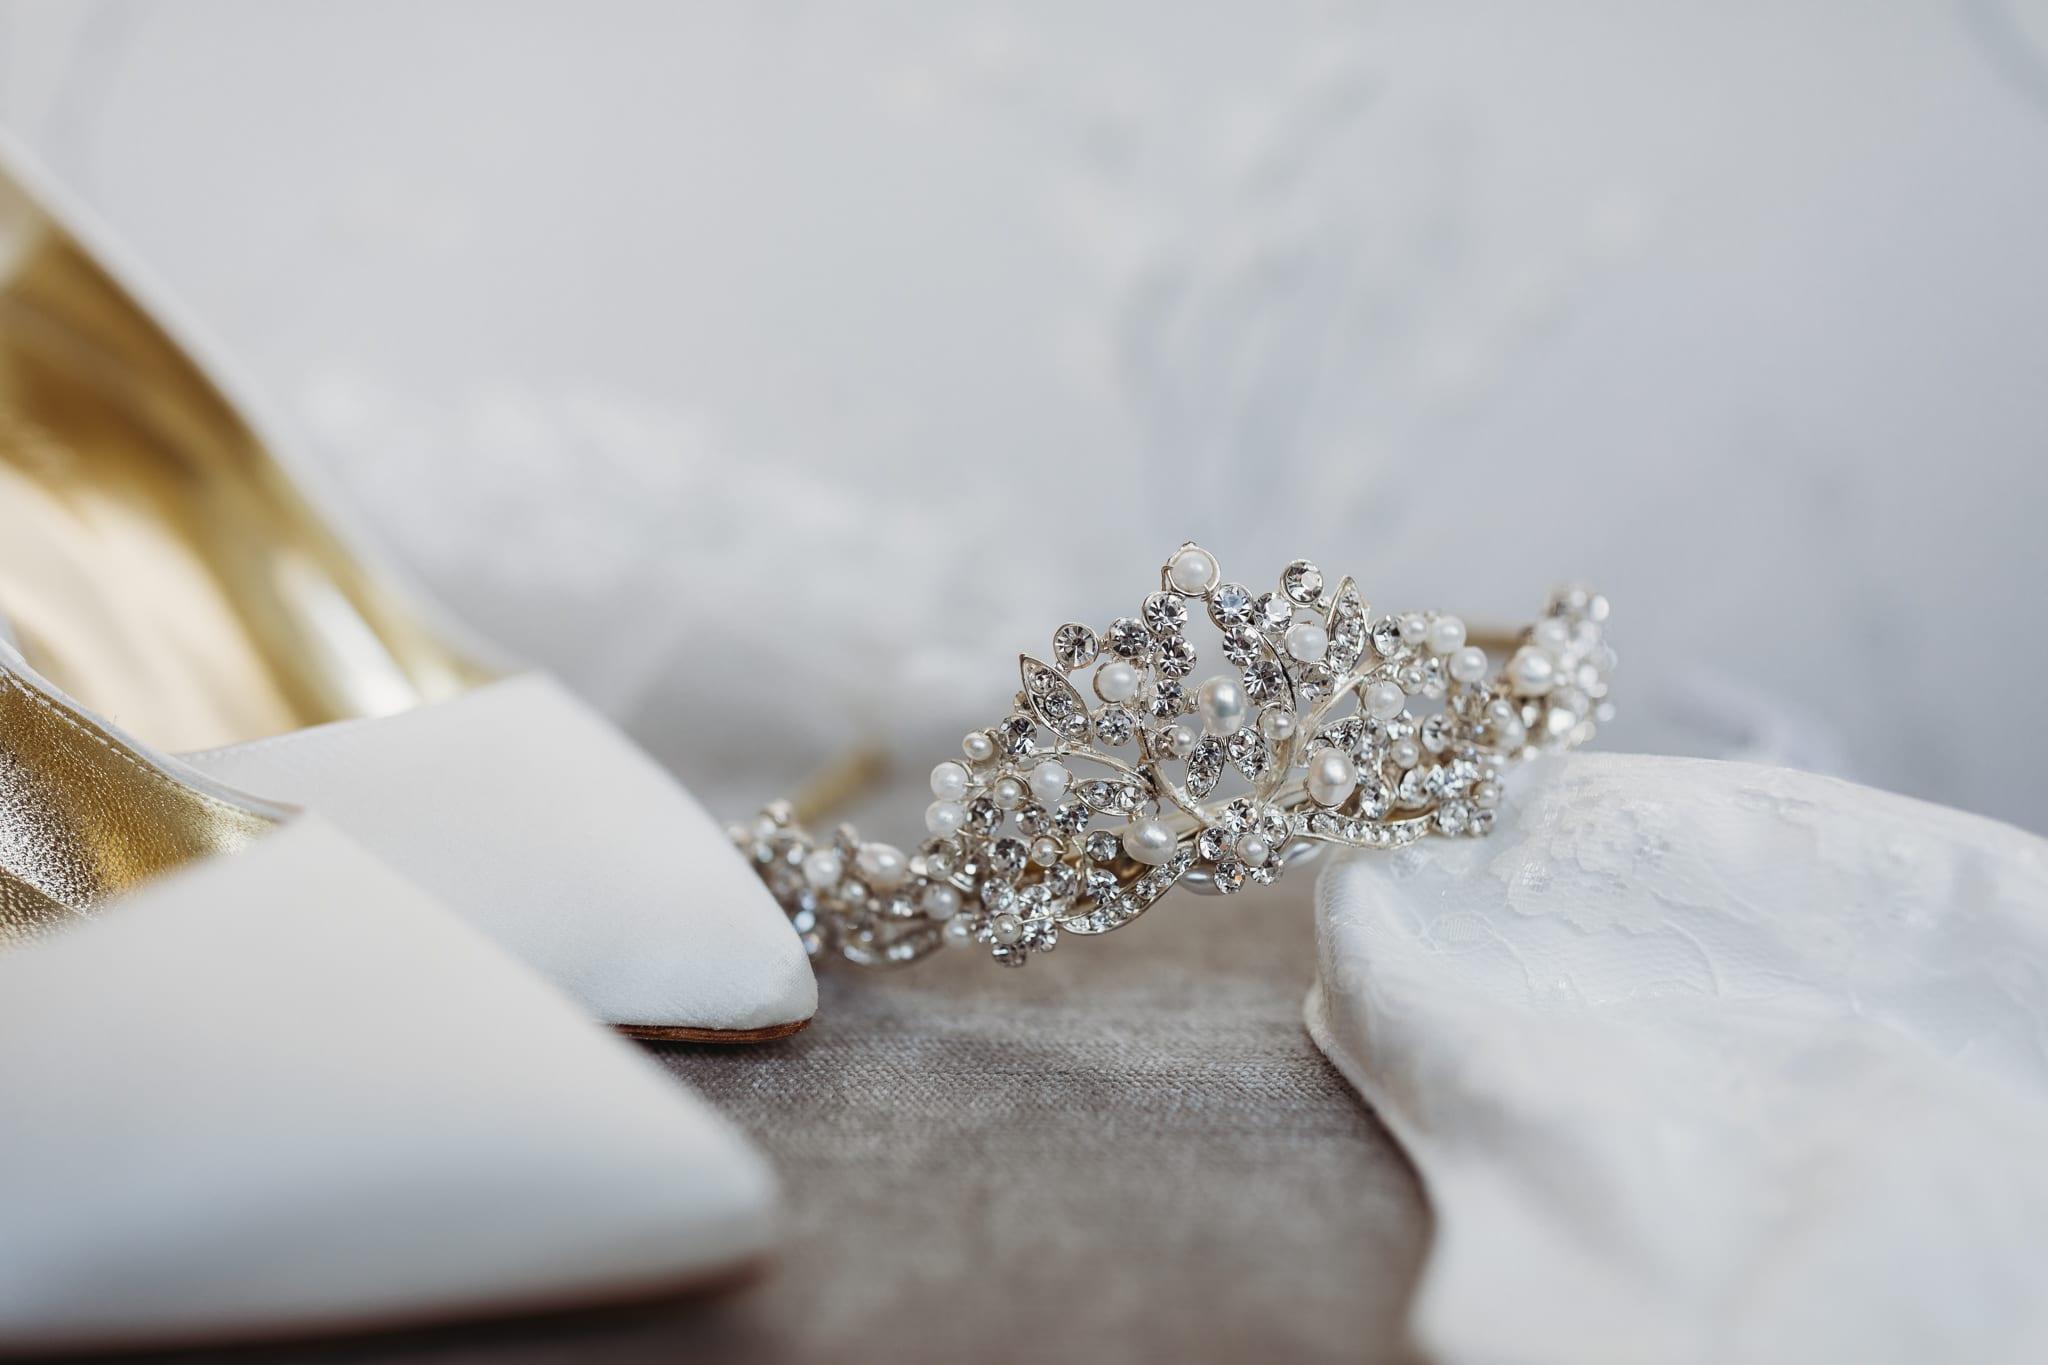 closeup of wedding tiara and bridal shoes